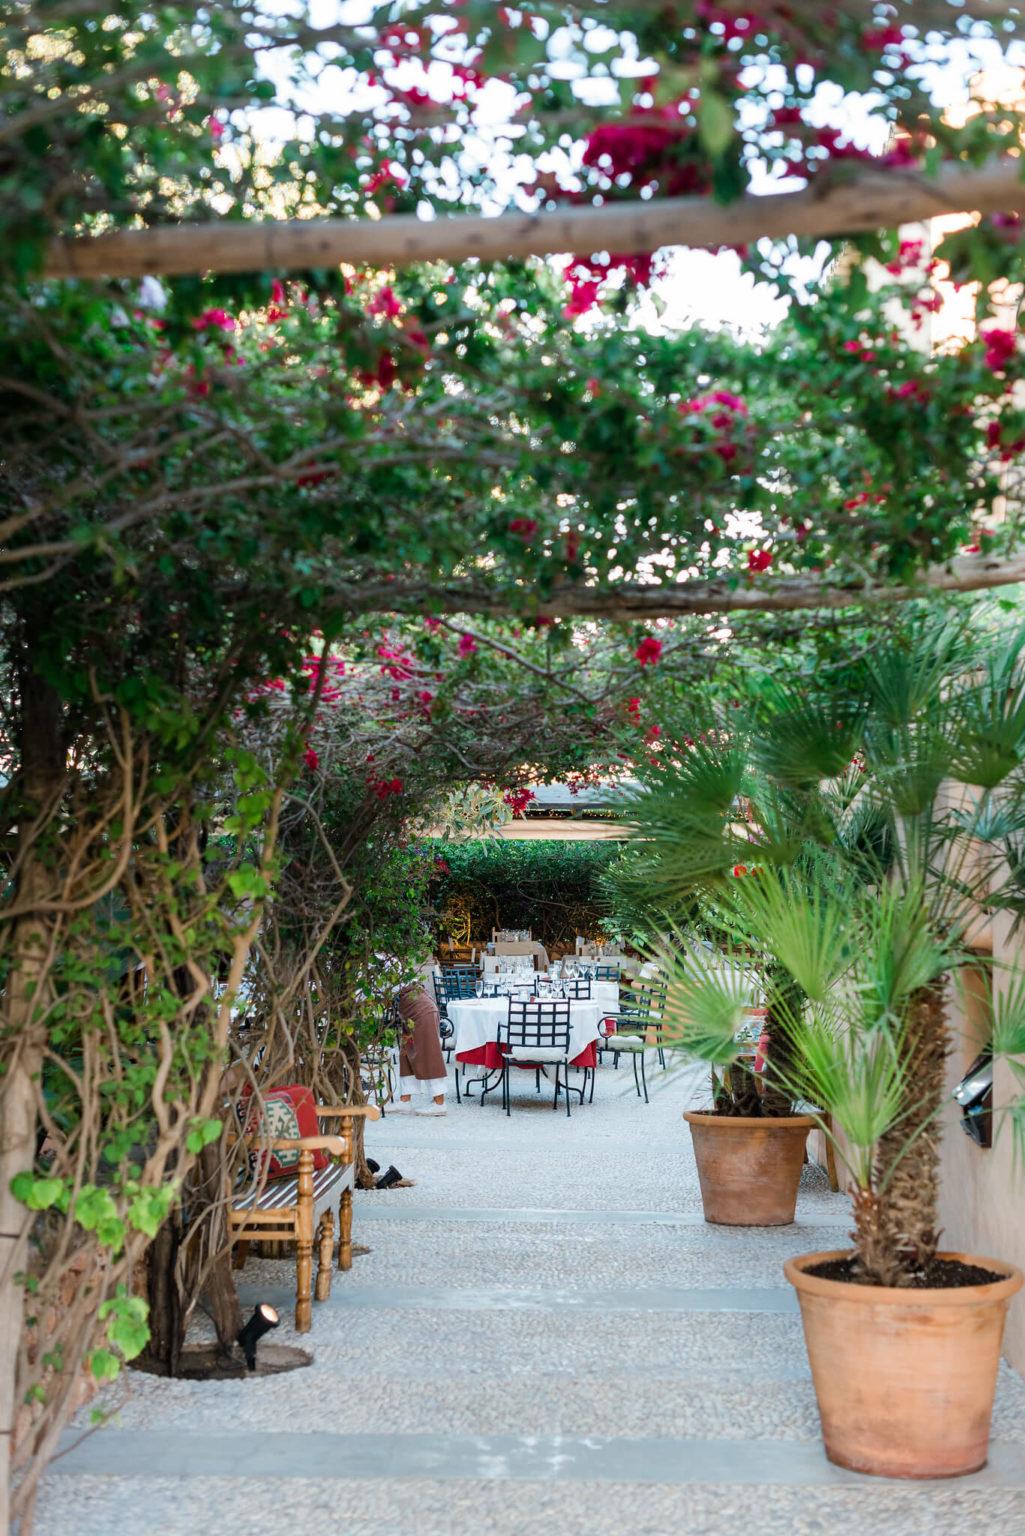 https://www.white-ibiza.com/wp-content/uploads/2020/03/formentera-restaurants-can-carlos-2020-10-1025x1536.jpg